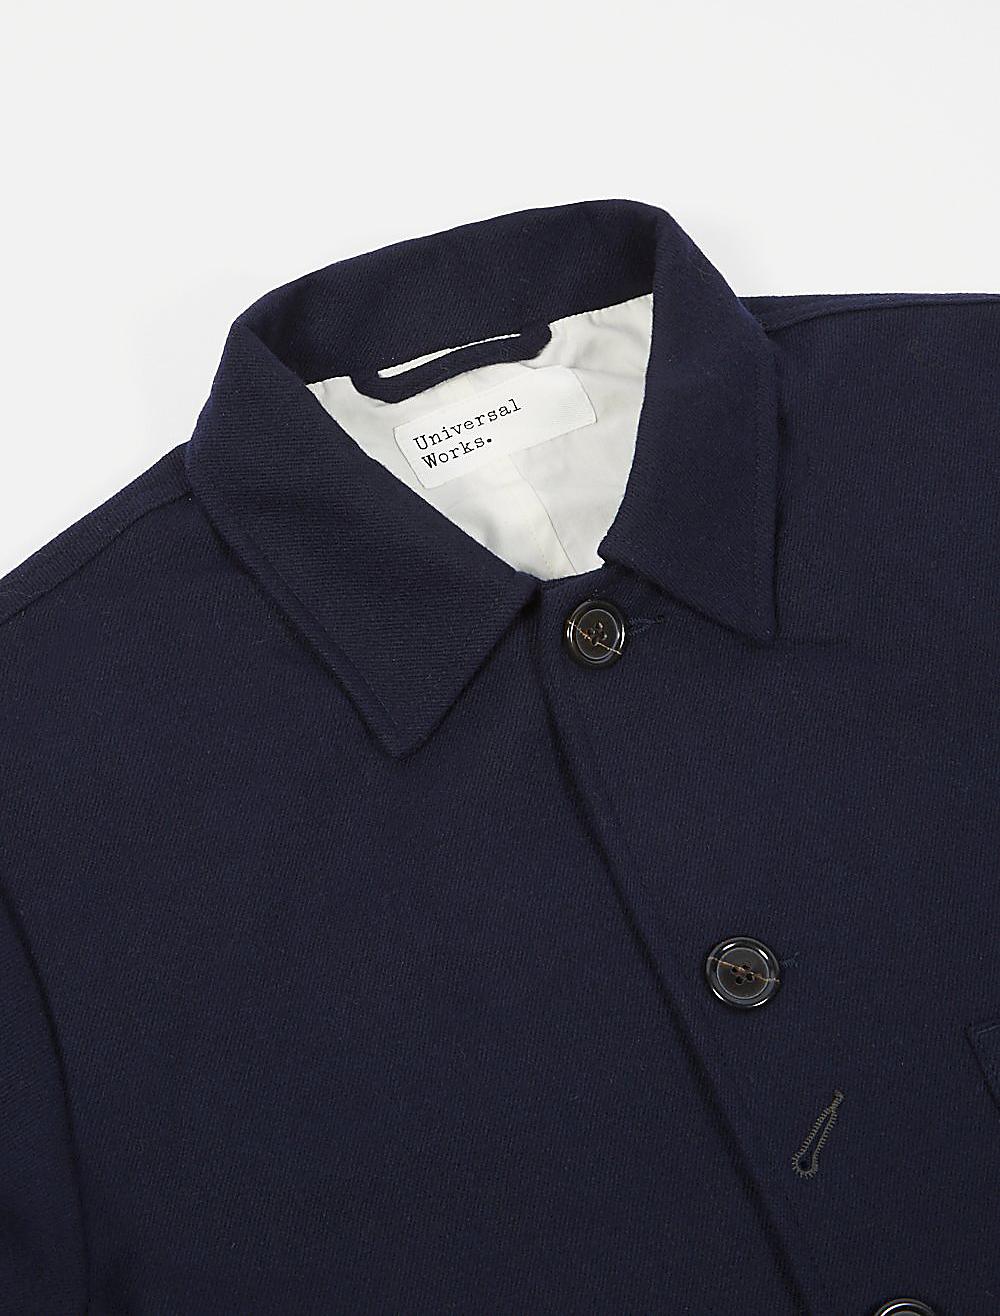 Universal Works Bakers Jacket Twill Wool Navy dettaglio collo